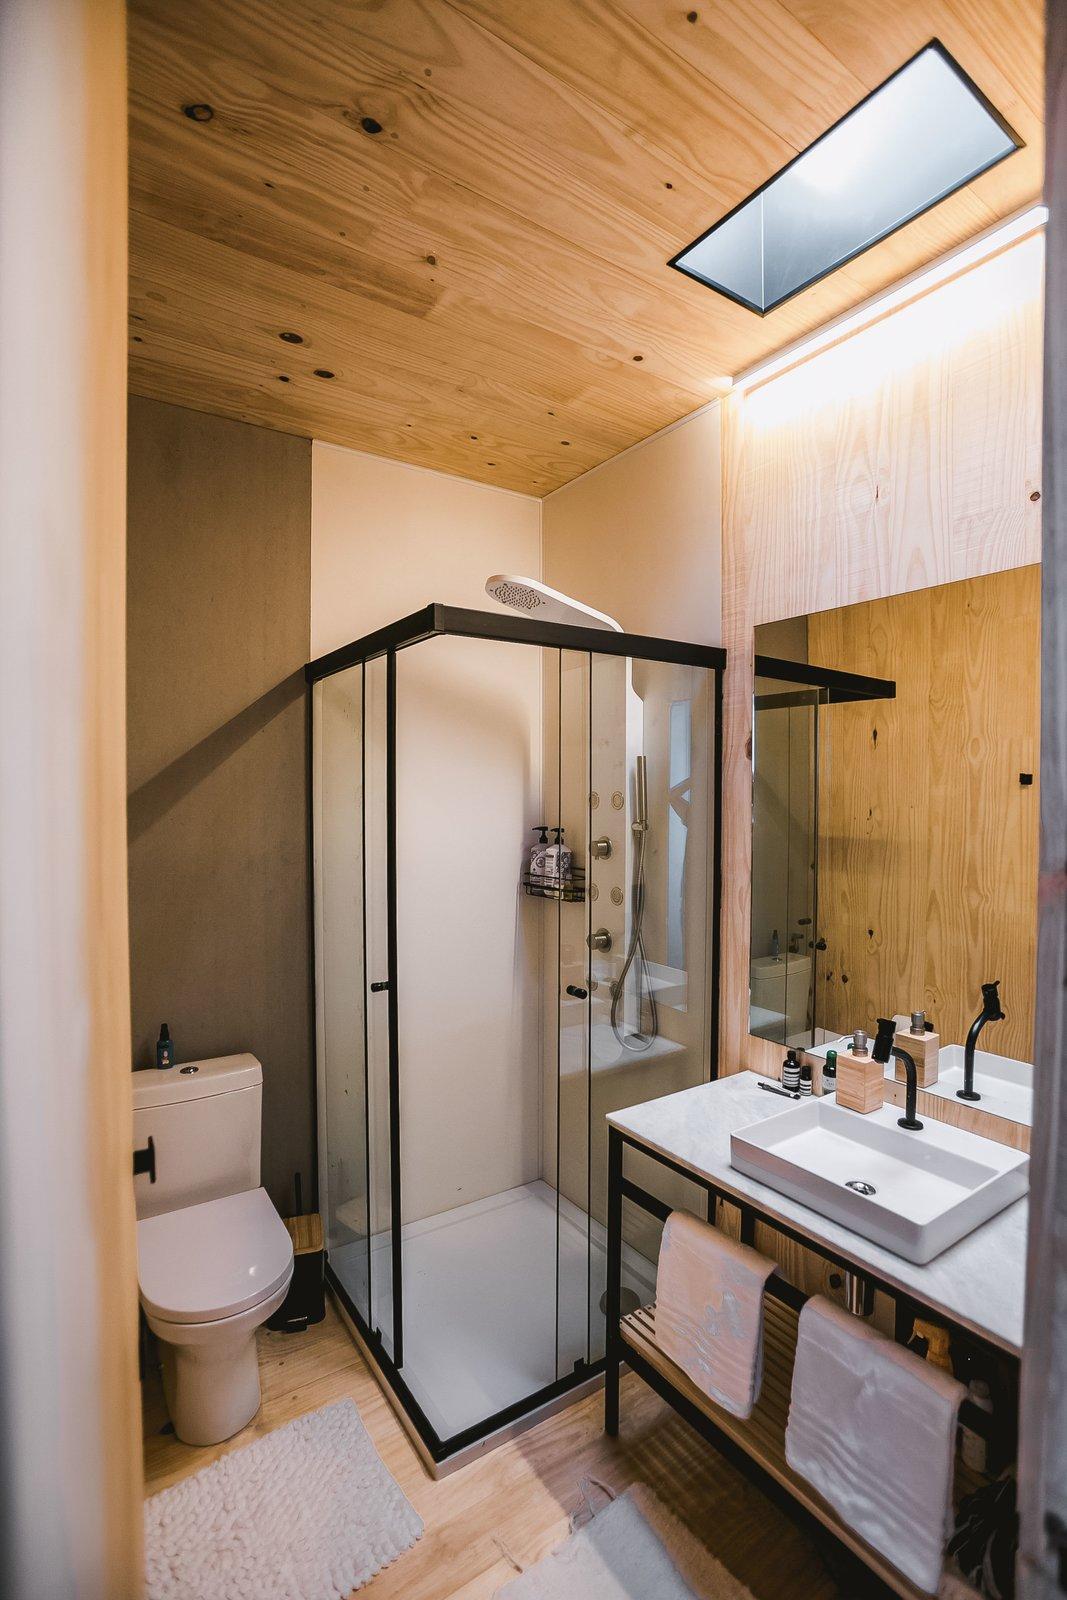 WaterlilliHaus bathroom